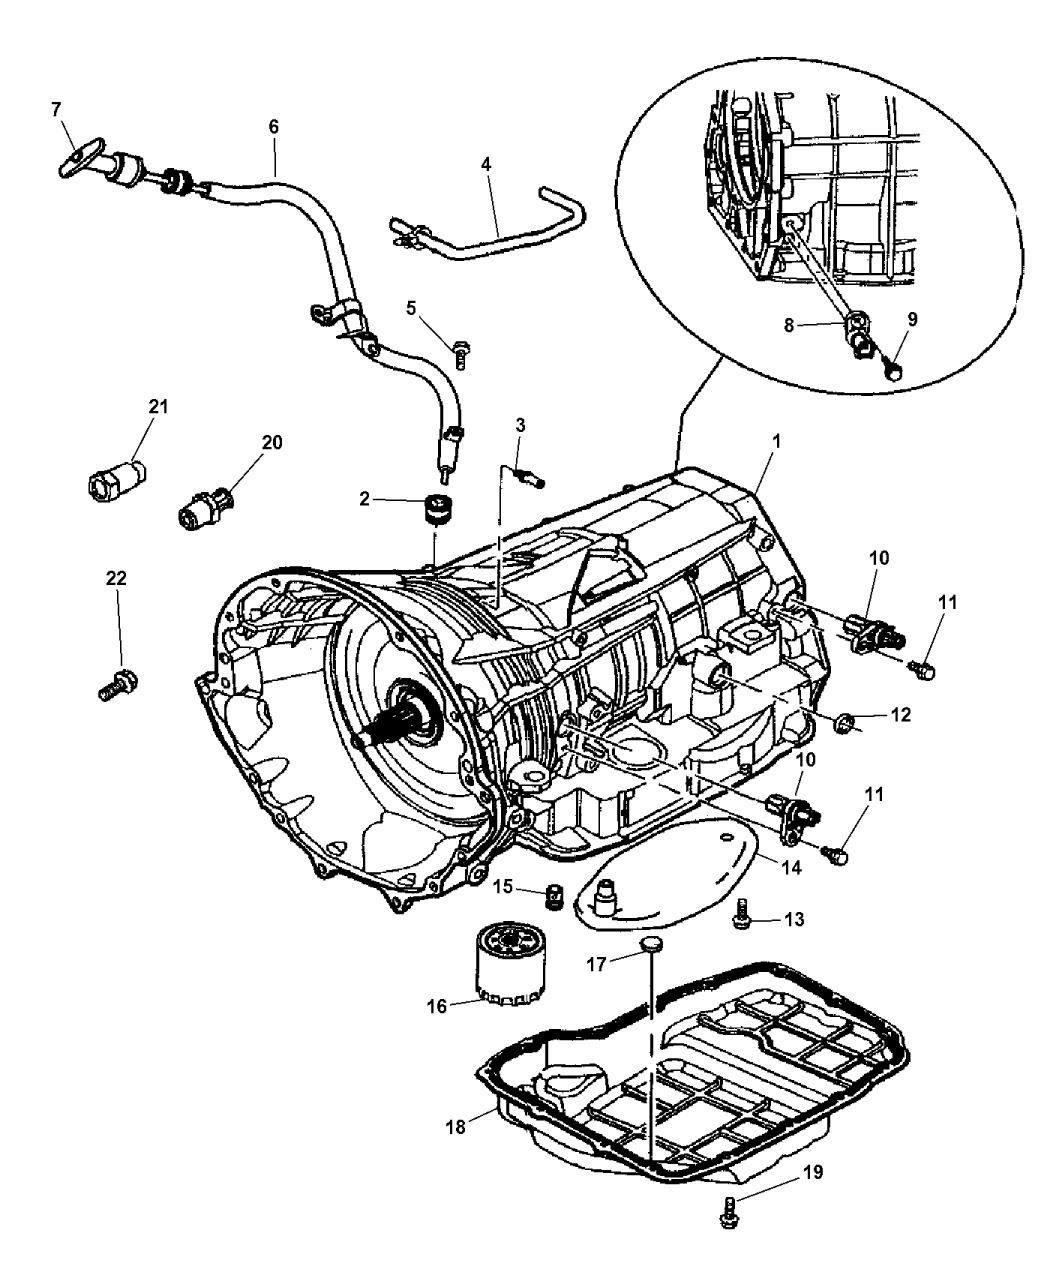 2005 Dodge Ram 2500 Parts Diagram Exhaust • Wiring Diagram